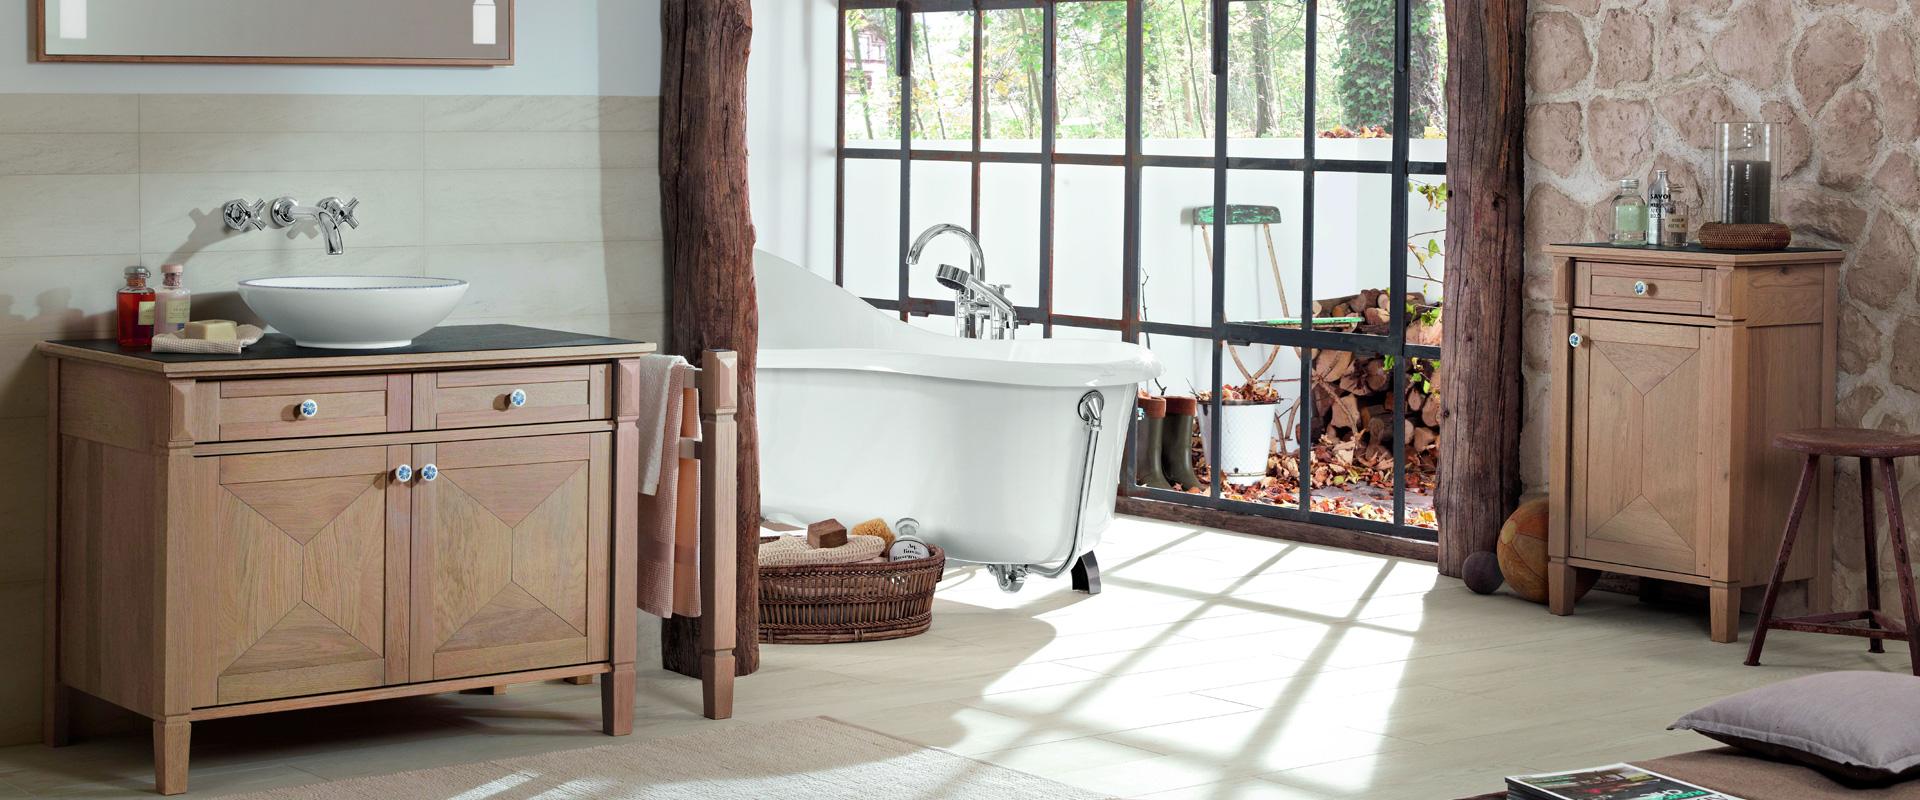 badm bel aus holz pflegeempfehlungen villeroy boch. Black Bedroom Furniture Sets. Home Design Ideas